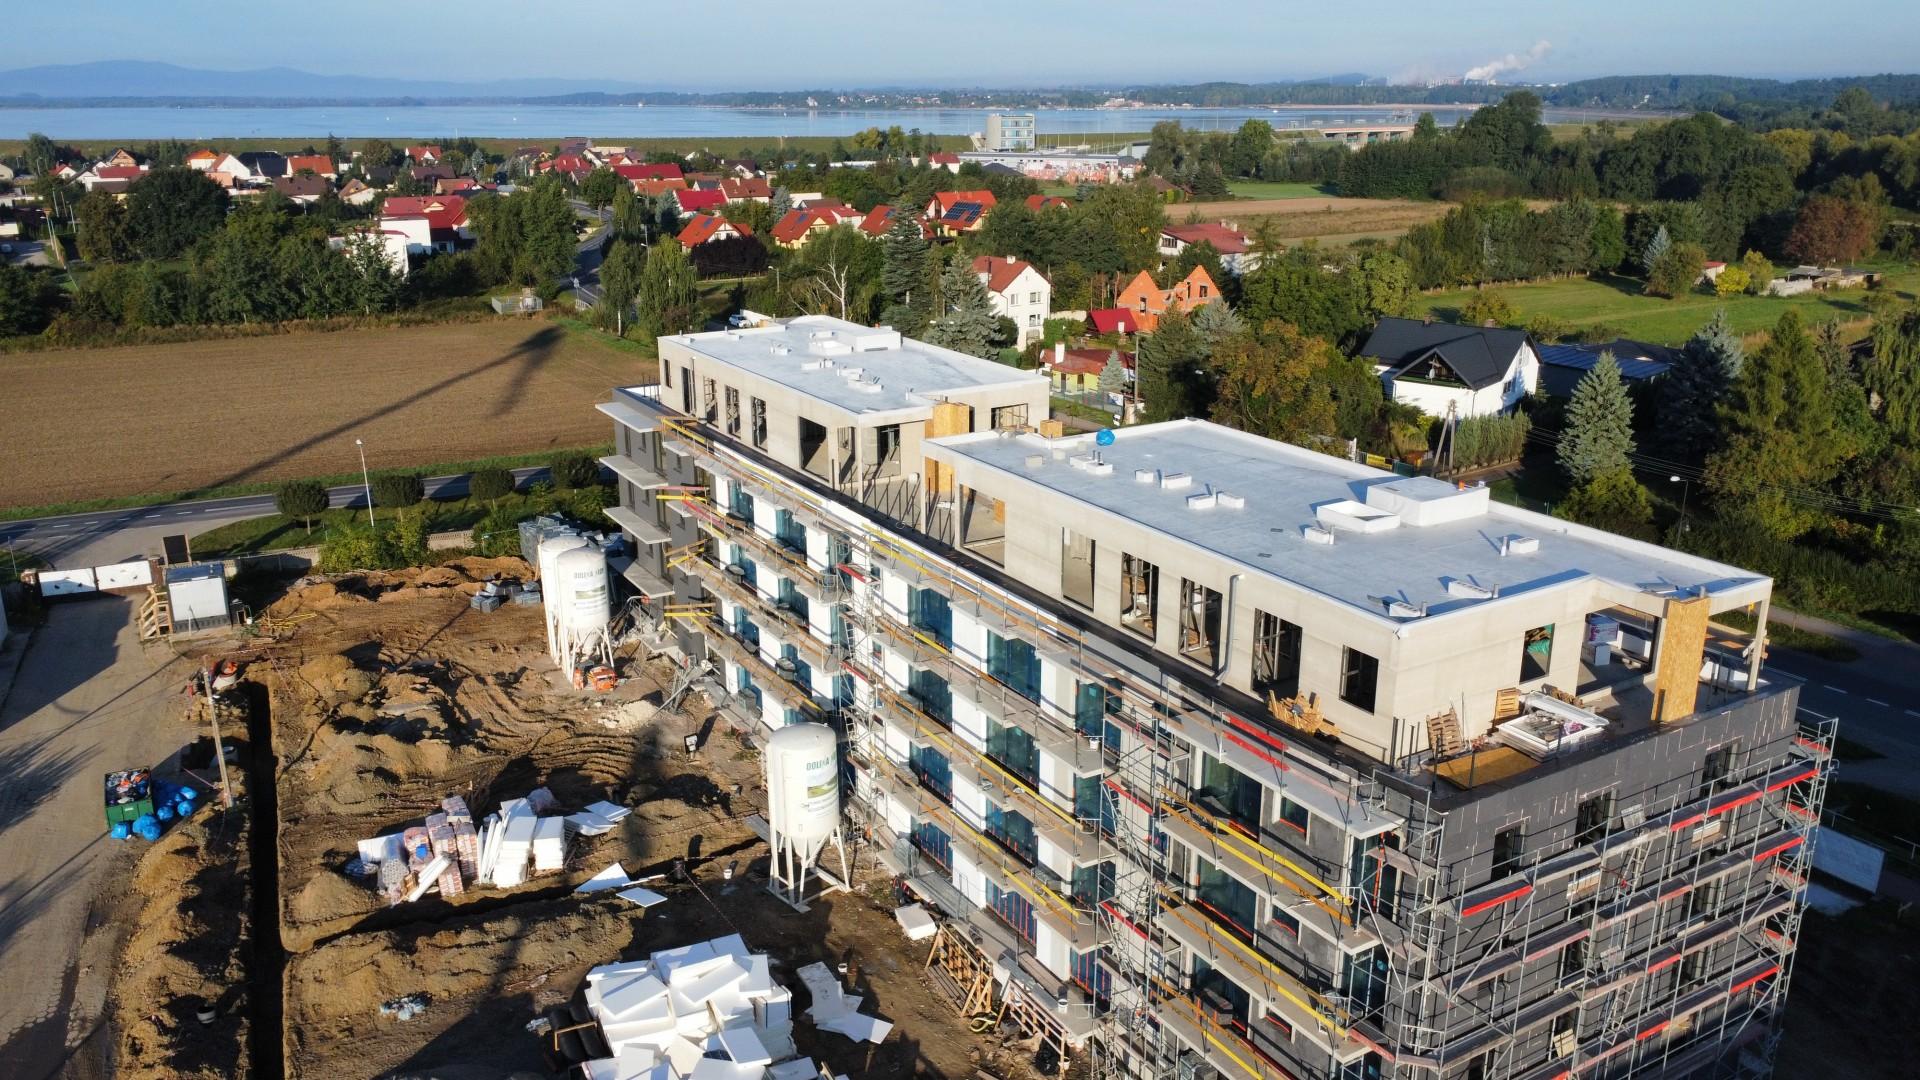 Belweder Park Nysa-zdjecie 28.09.2021 4